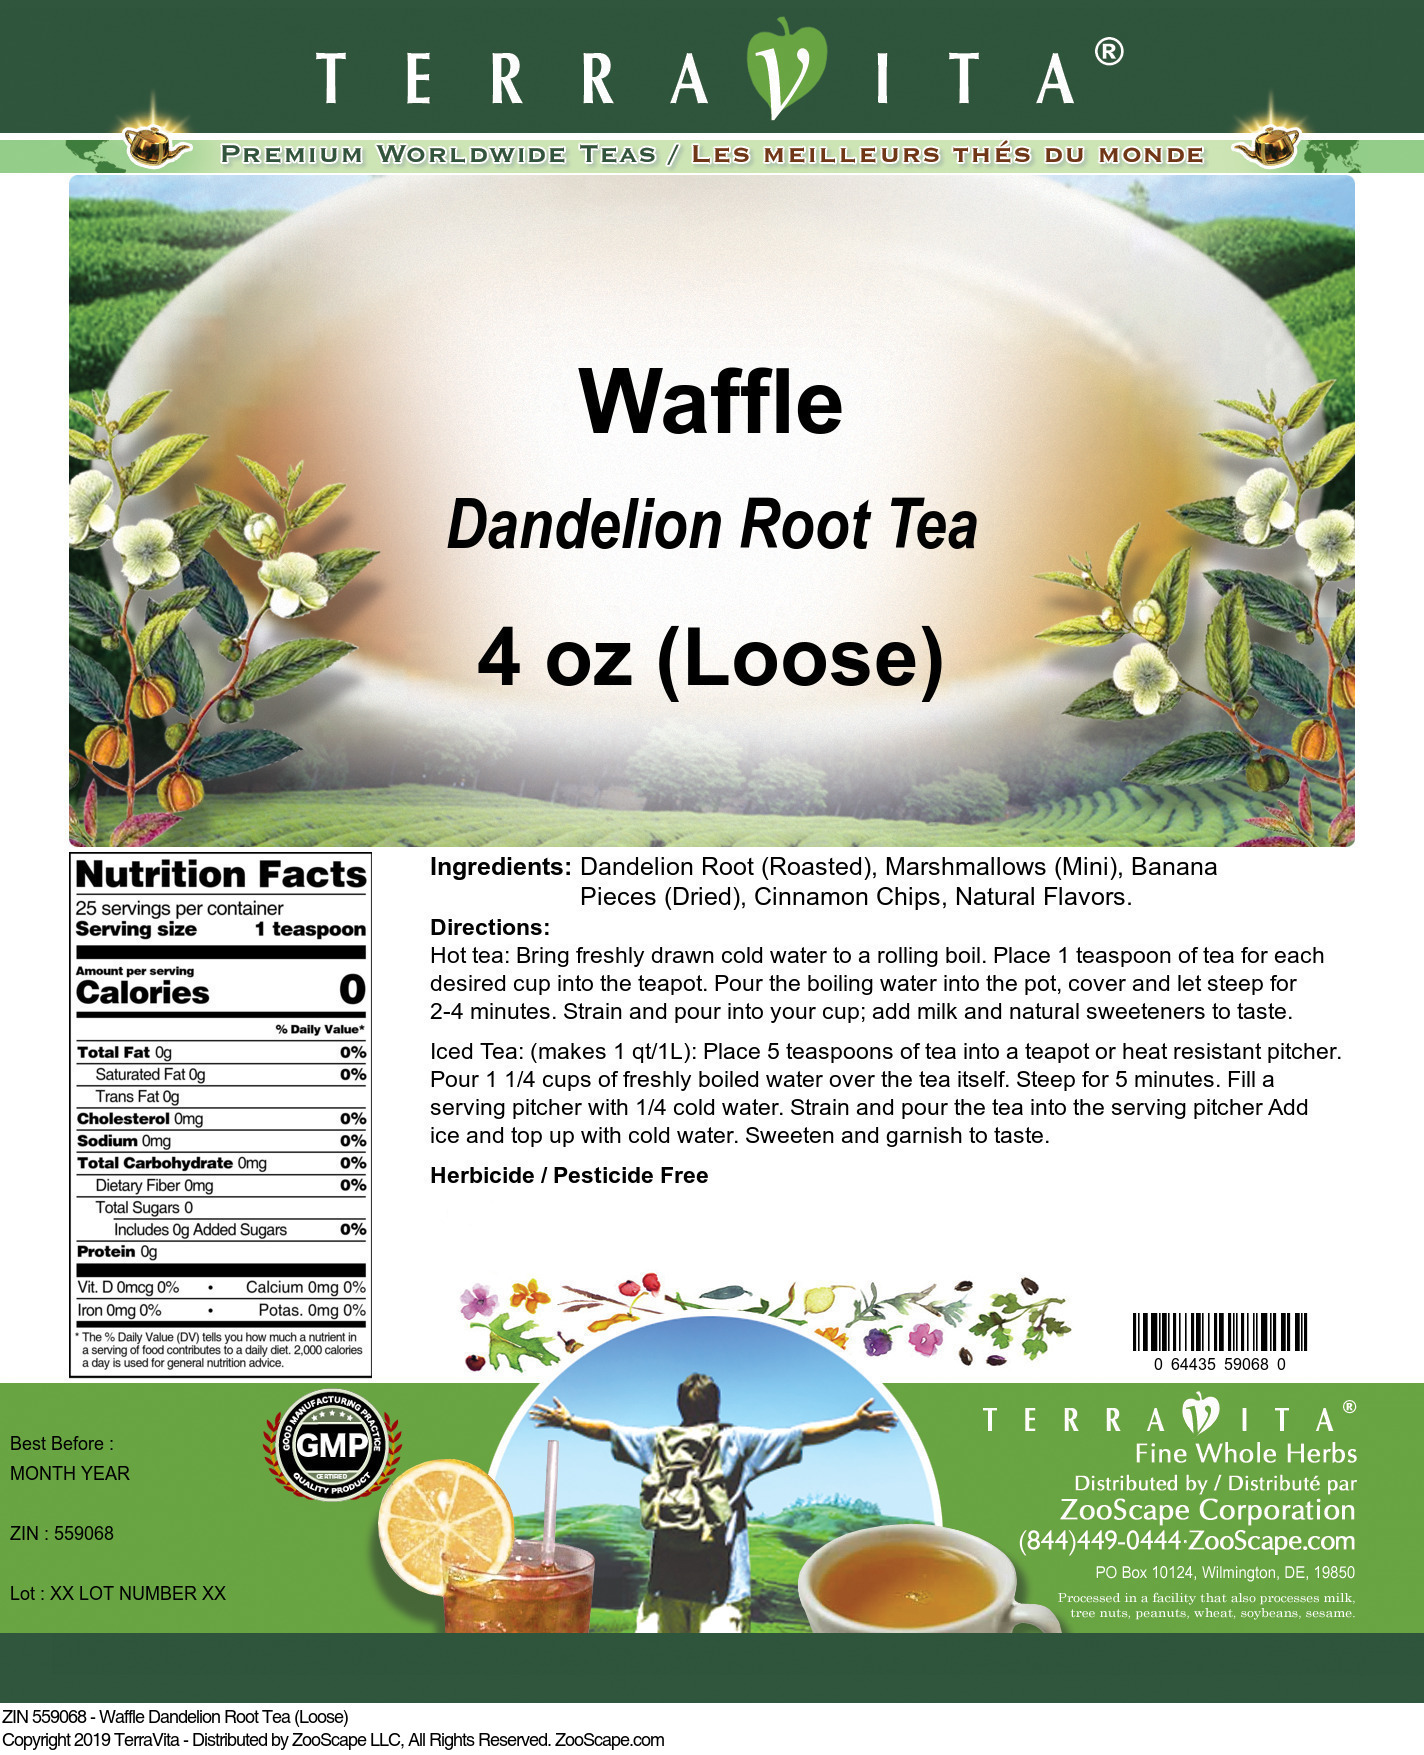 Waffle Dandelion Root